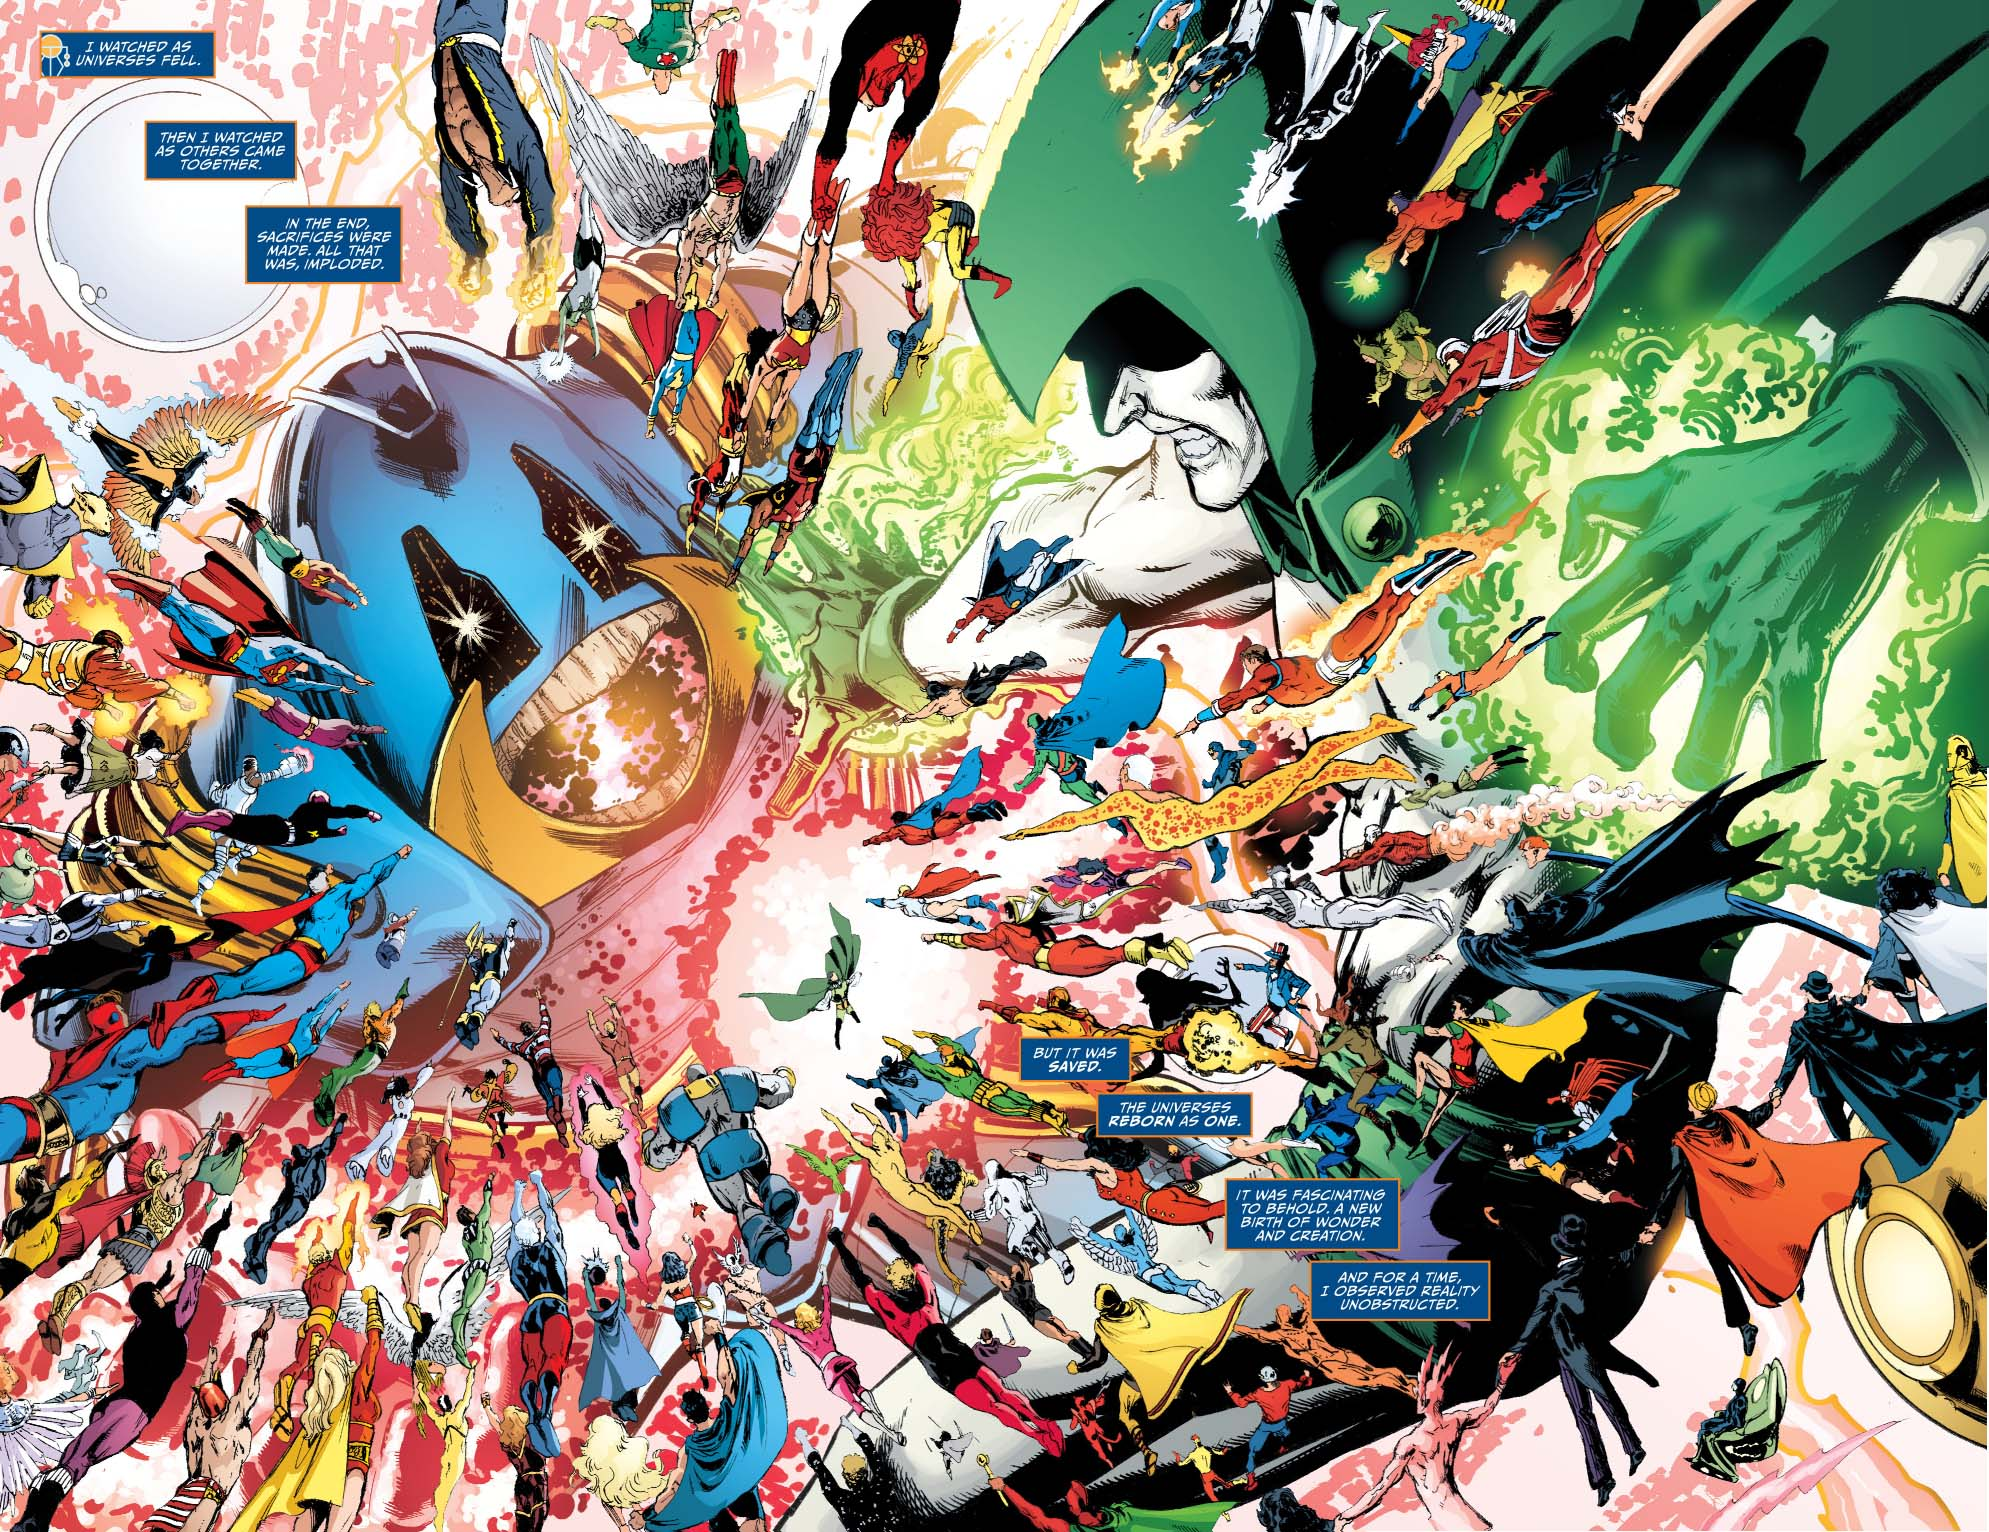 Metron Describes The DC Crises – Comicnewbies